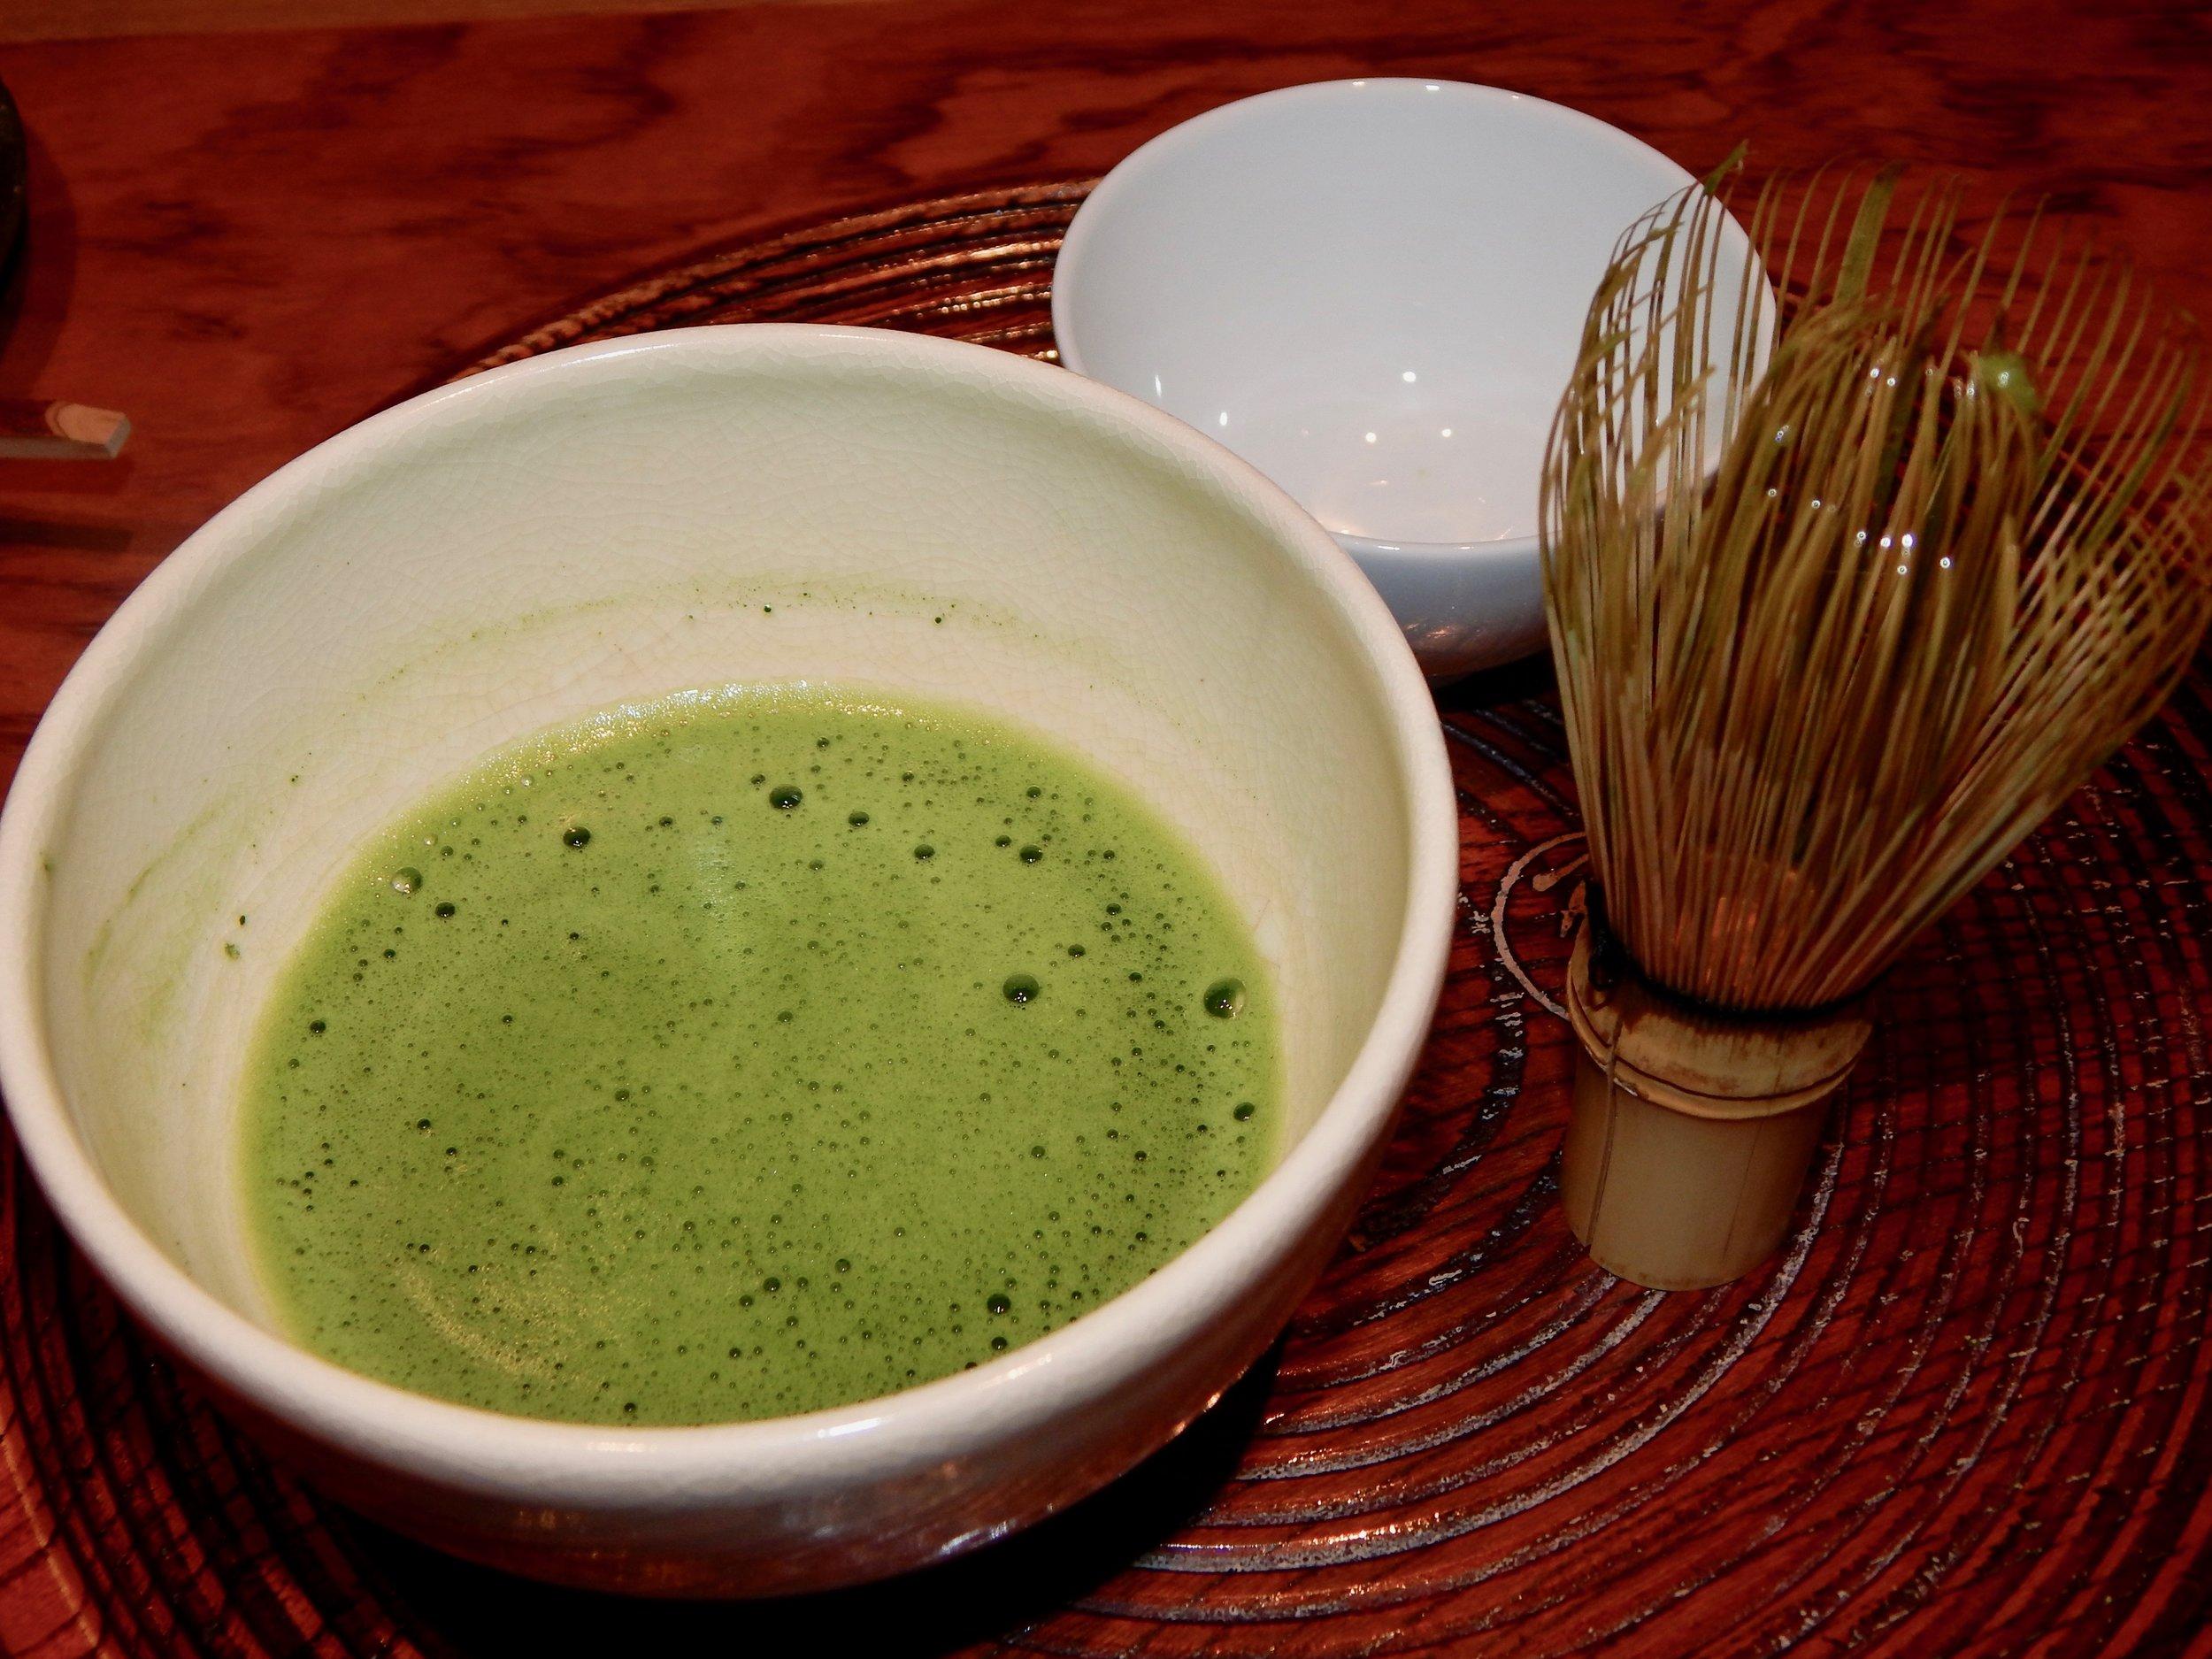 Authentic Matcha Green Tea—Tokyo, Japan